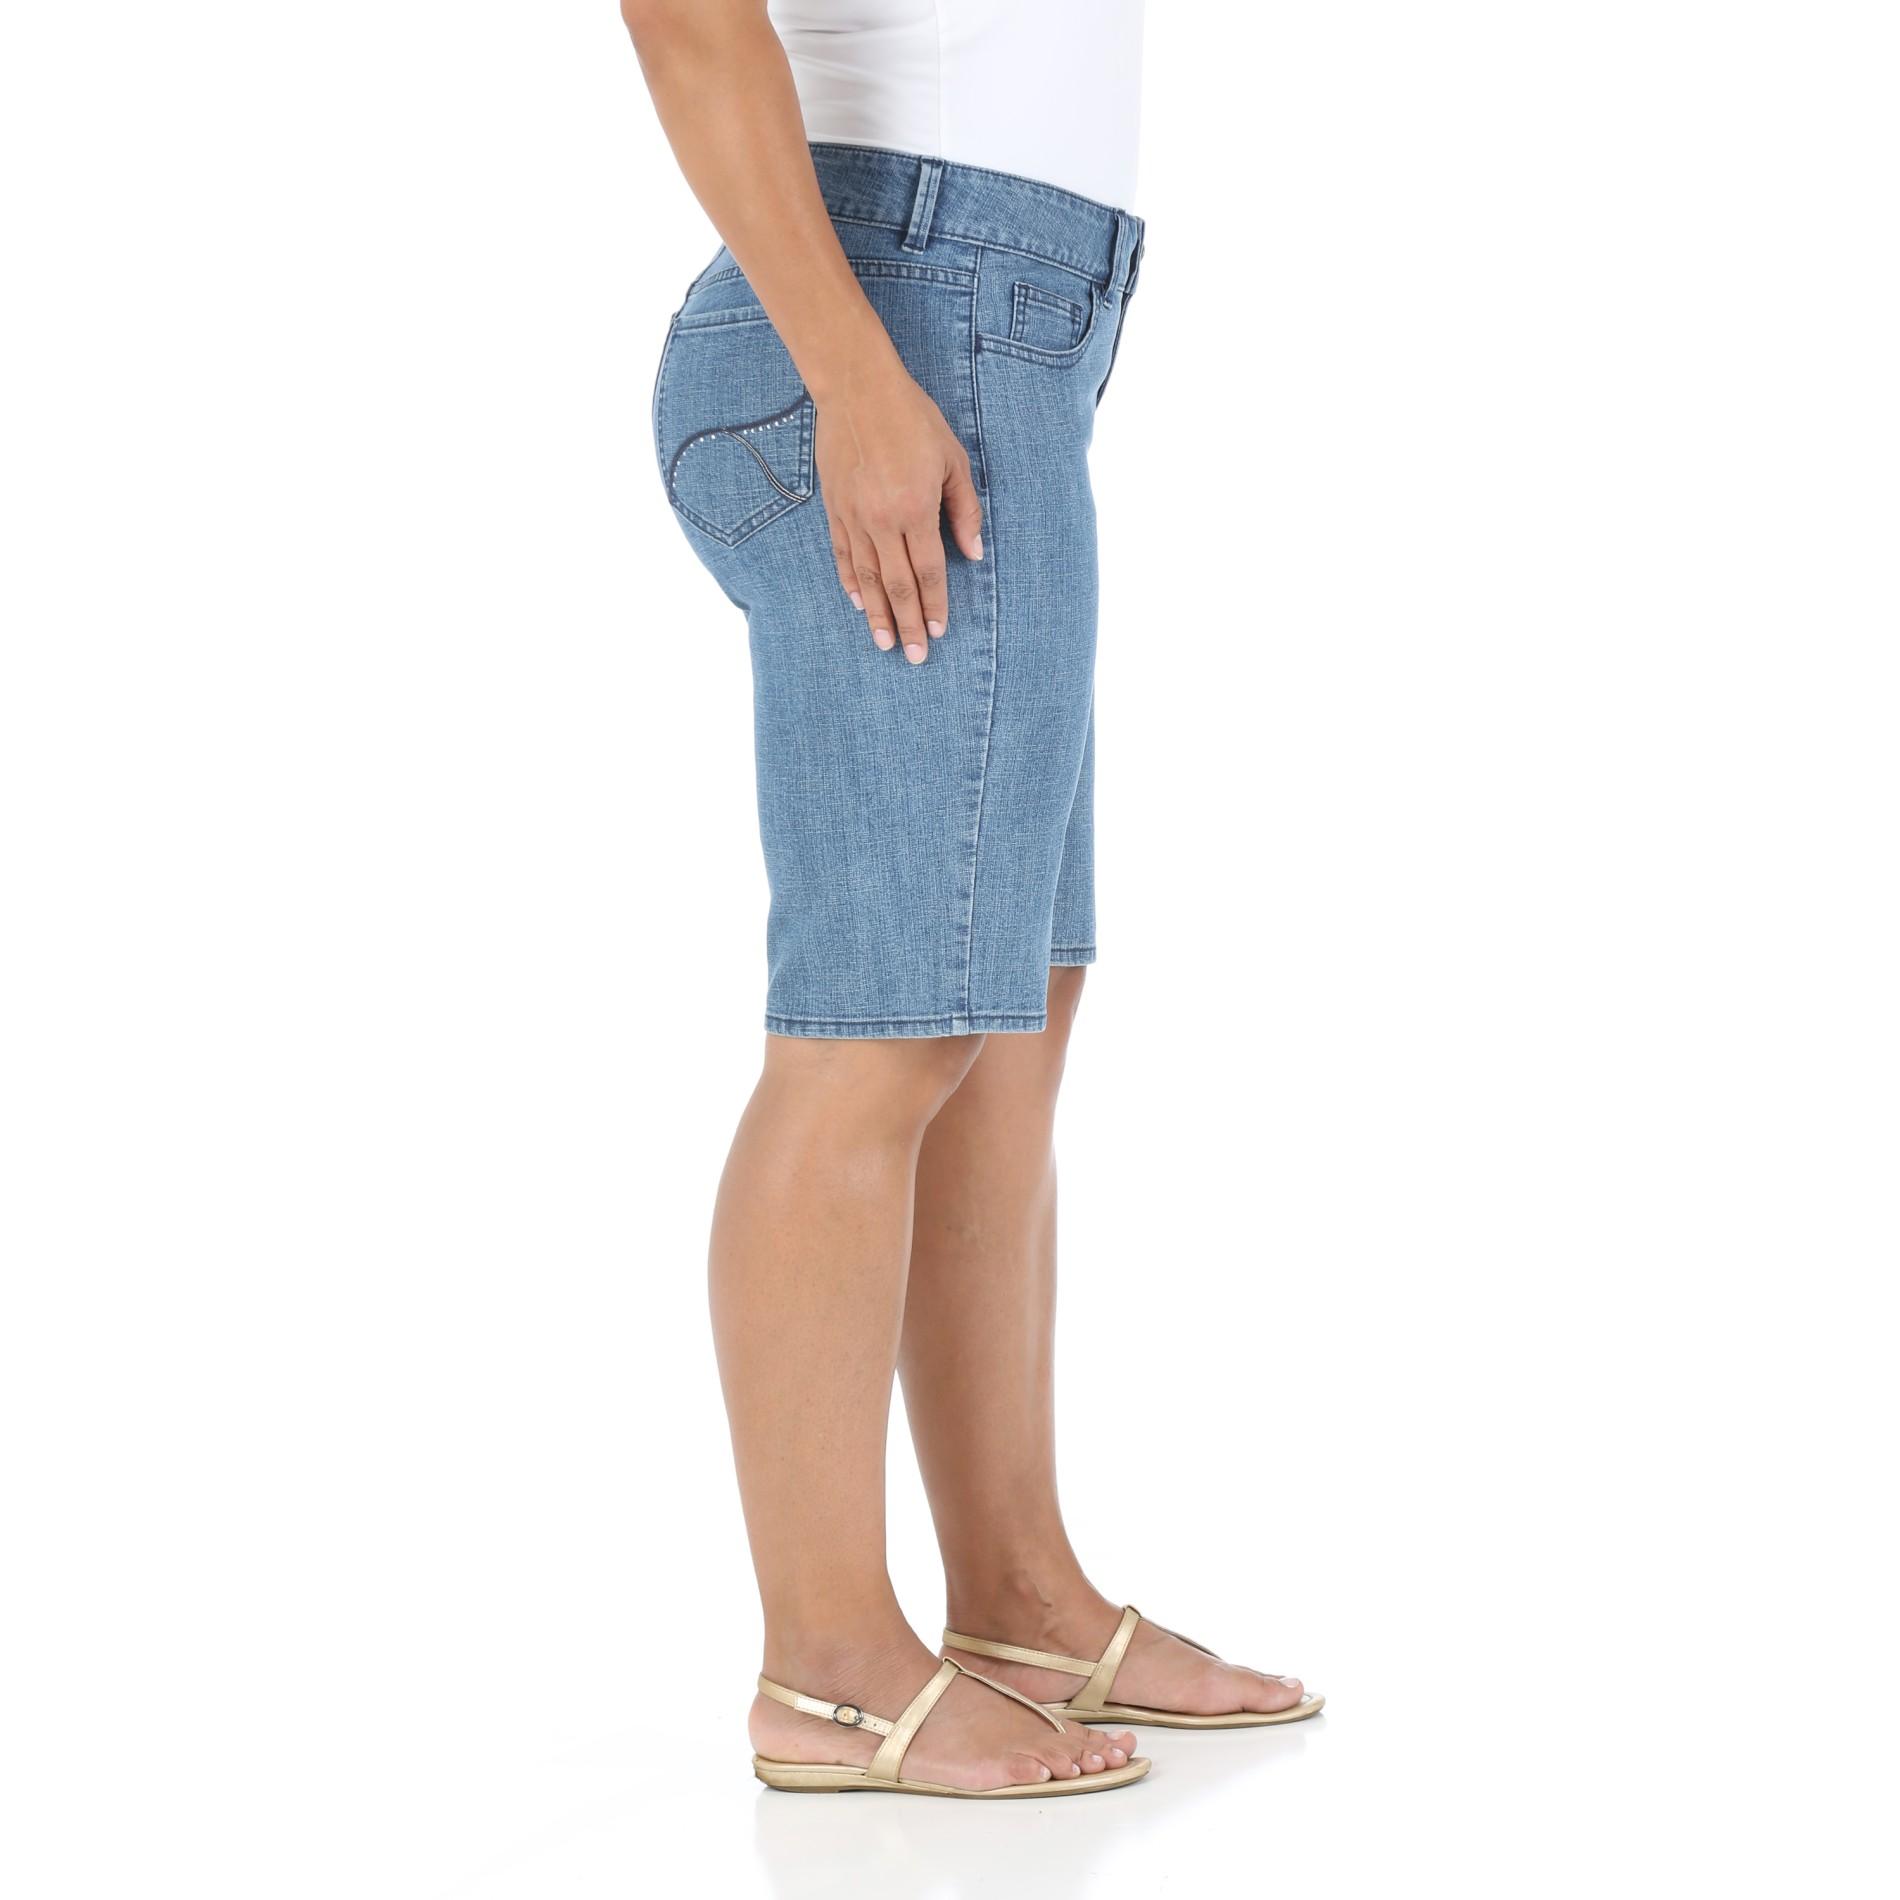 4d1b175876 Riders by Lee Women s Plus Surf Slender Stretch Denim Shorts